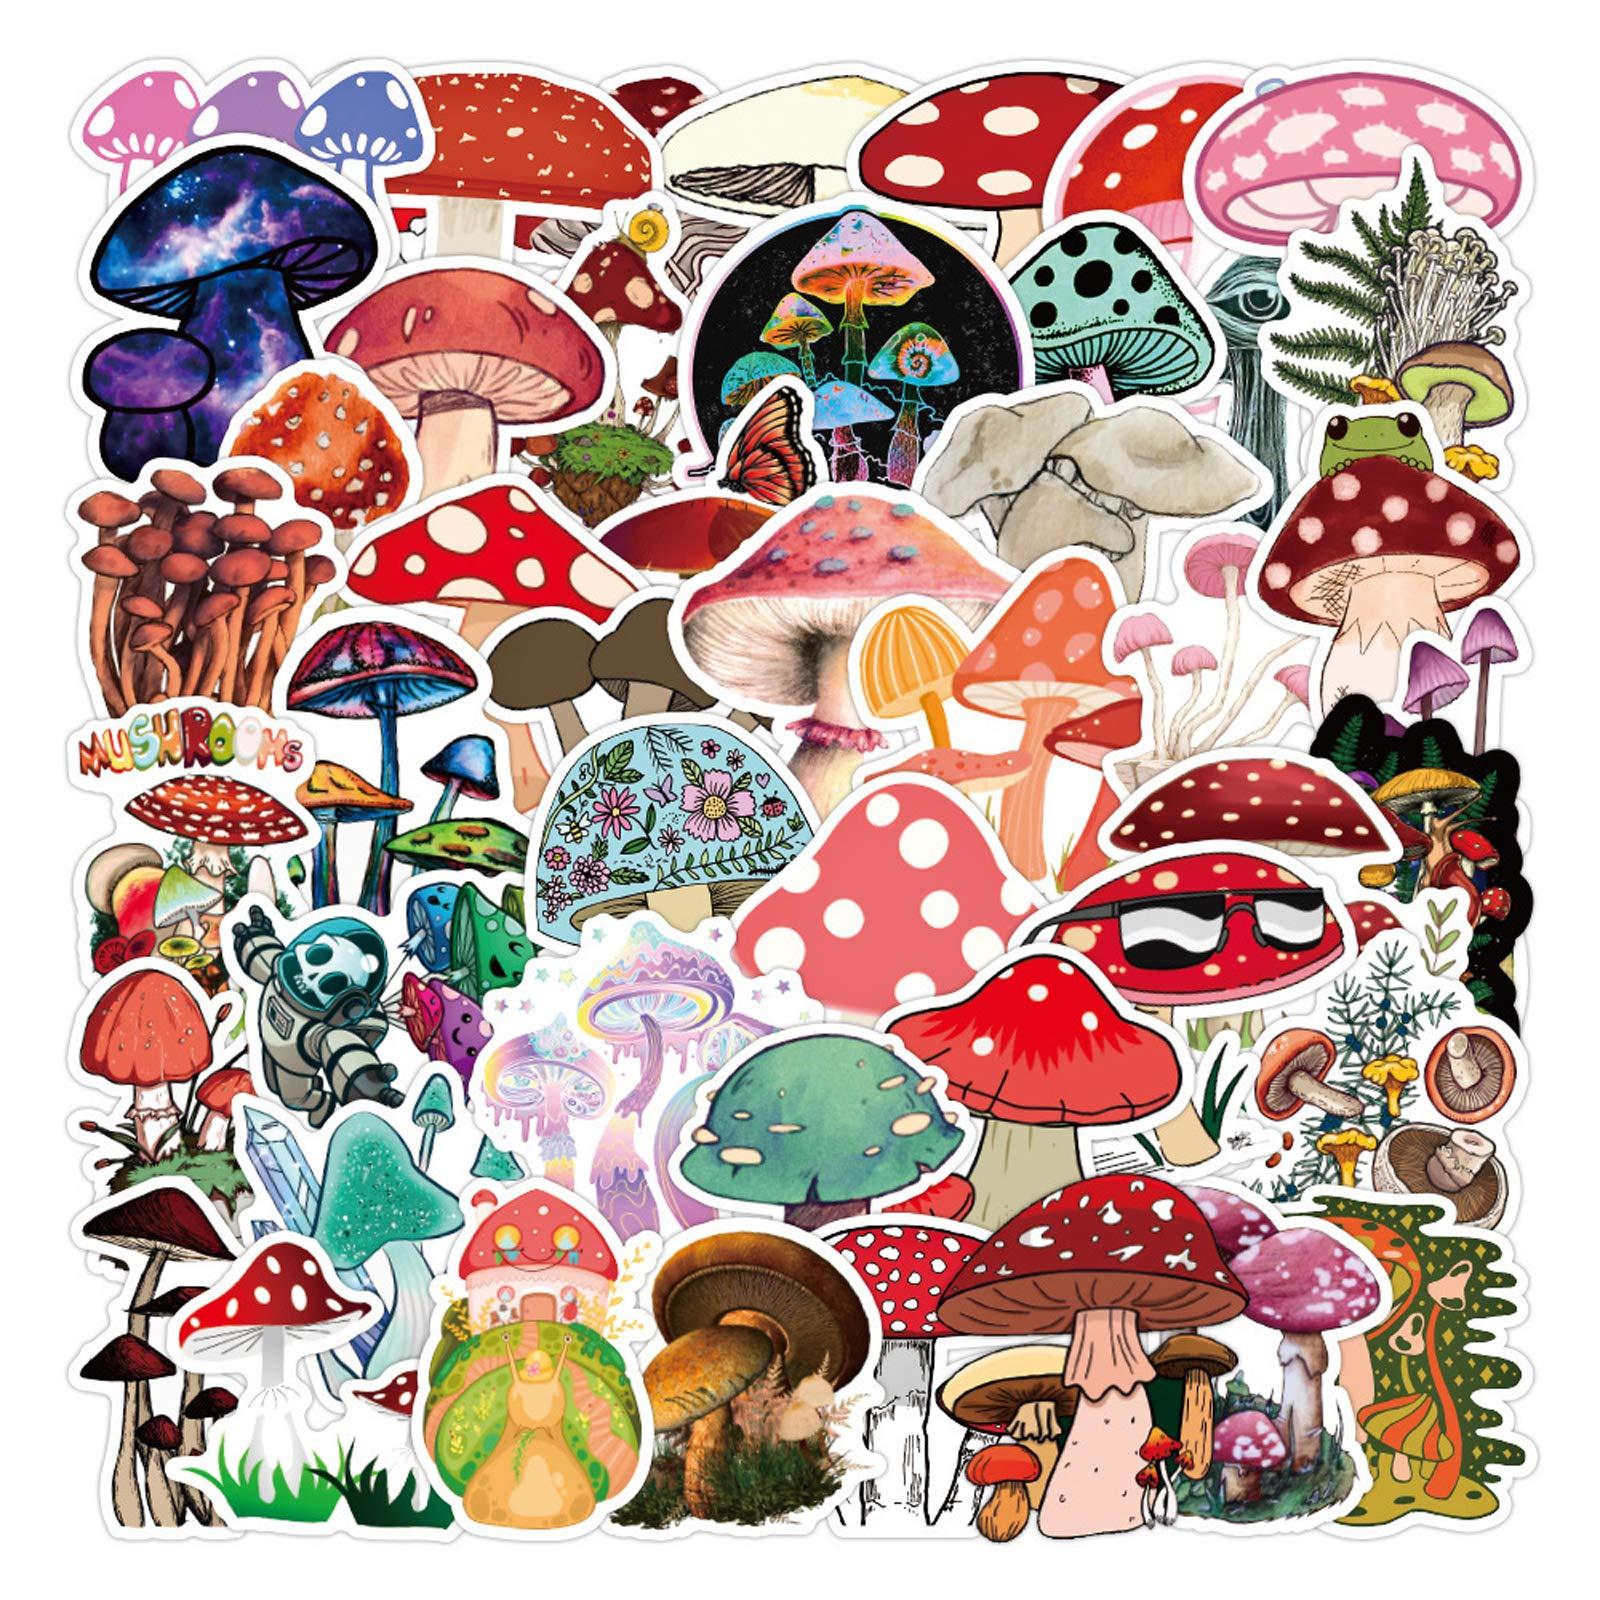 Mushroom Stickers  50 PCS   Vinyl Waterproof Stickers for Laptop,Skateboard,Water Bottles,Computer,Phone,Guitar,Bat Stickers for Kids Adult (Mushroom Stickers)